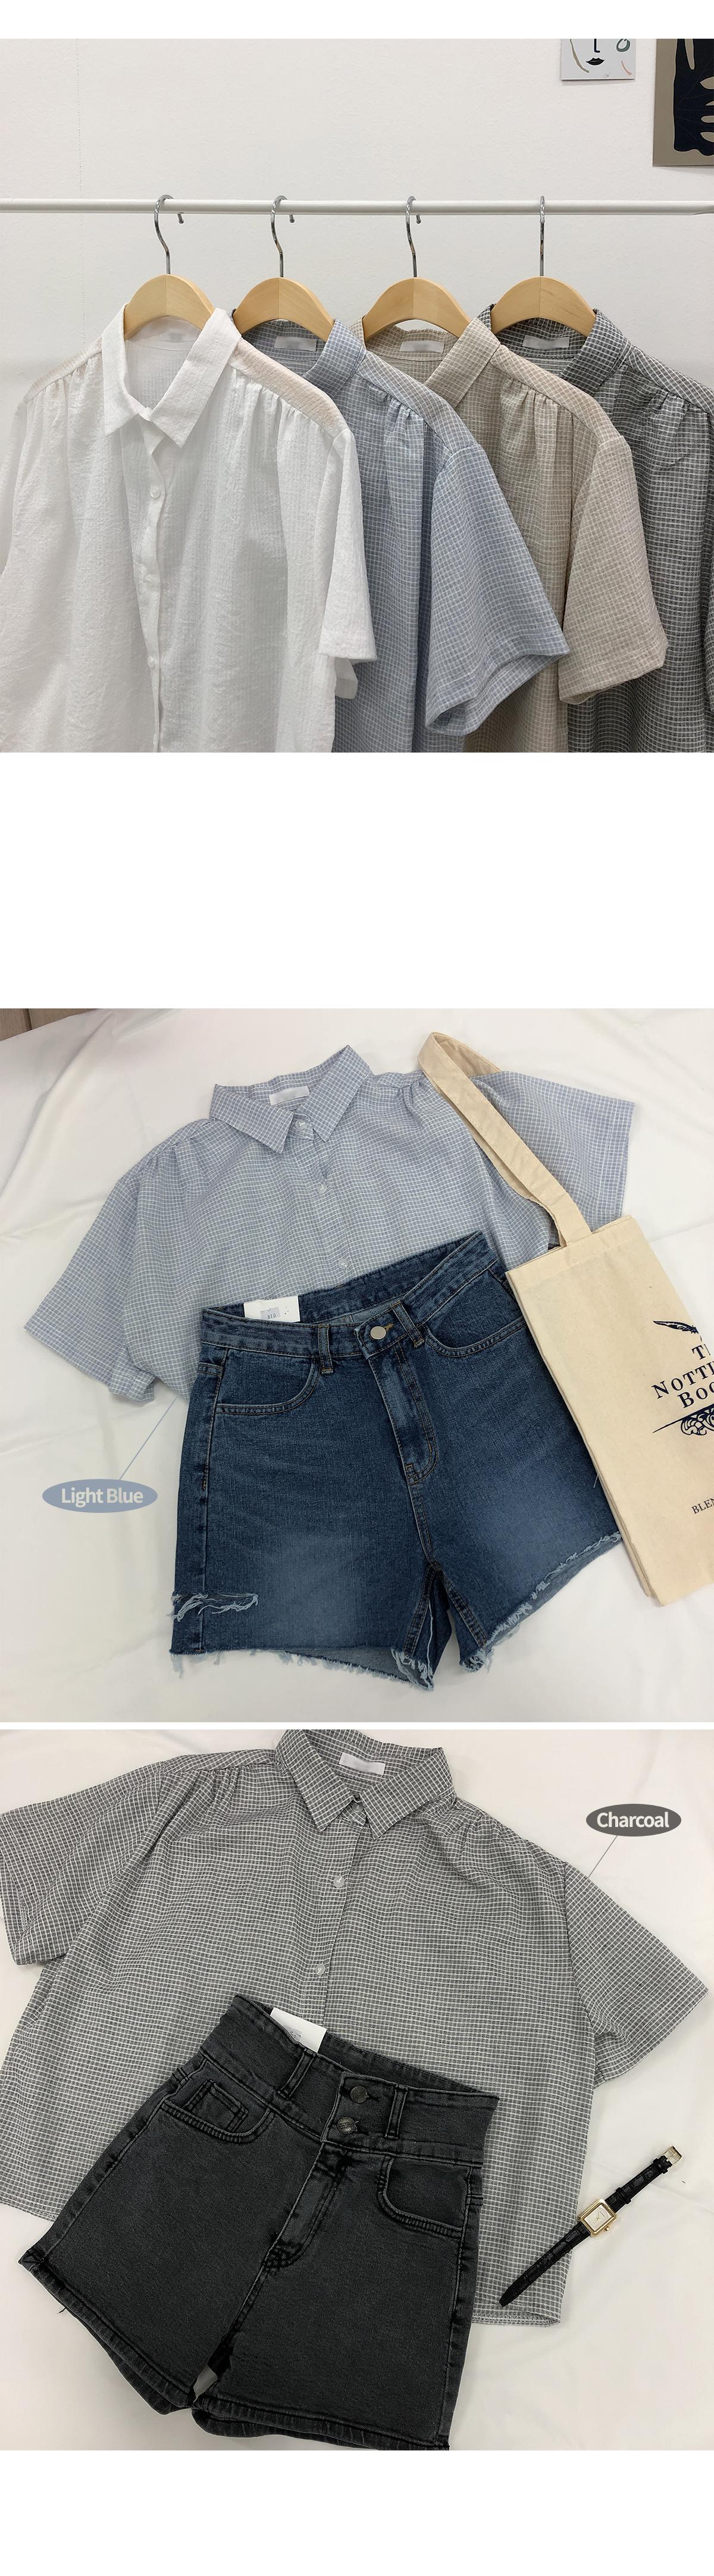 melo short sleeve shirt